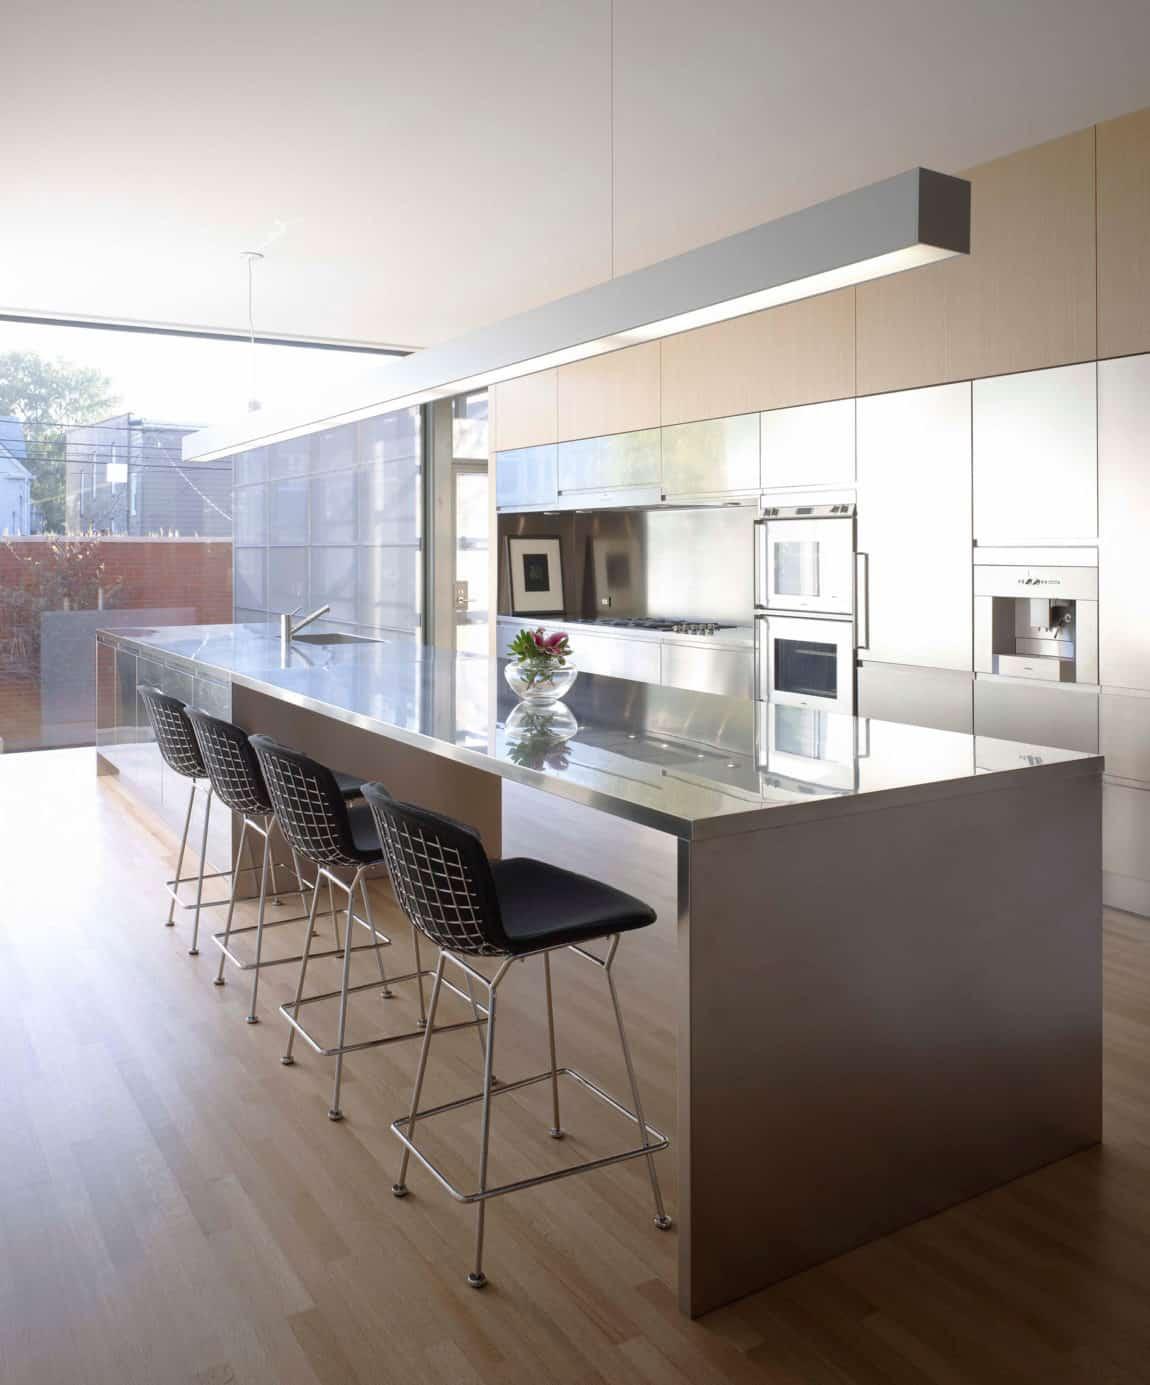 Claremont House by Brininstool + Lynch (12)